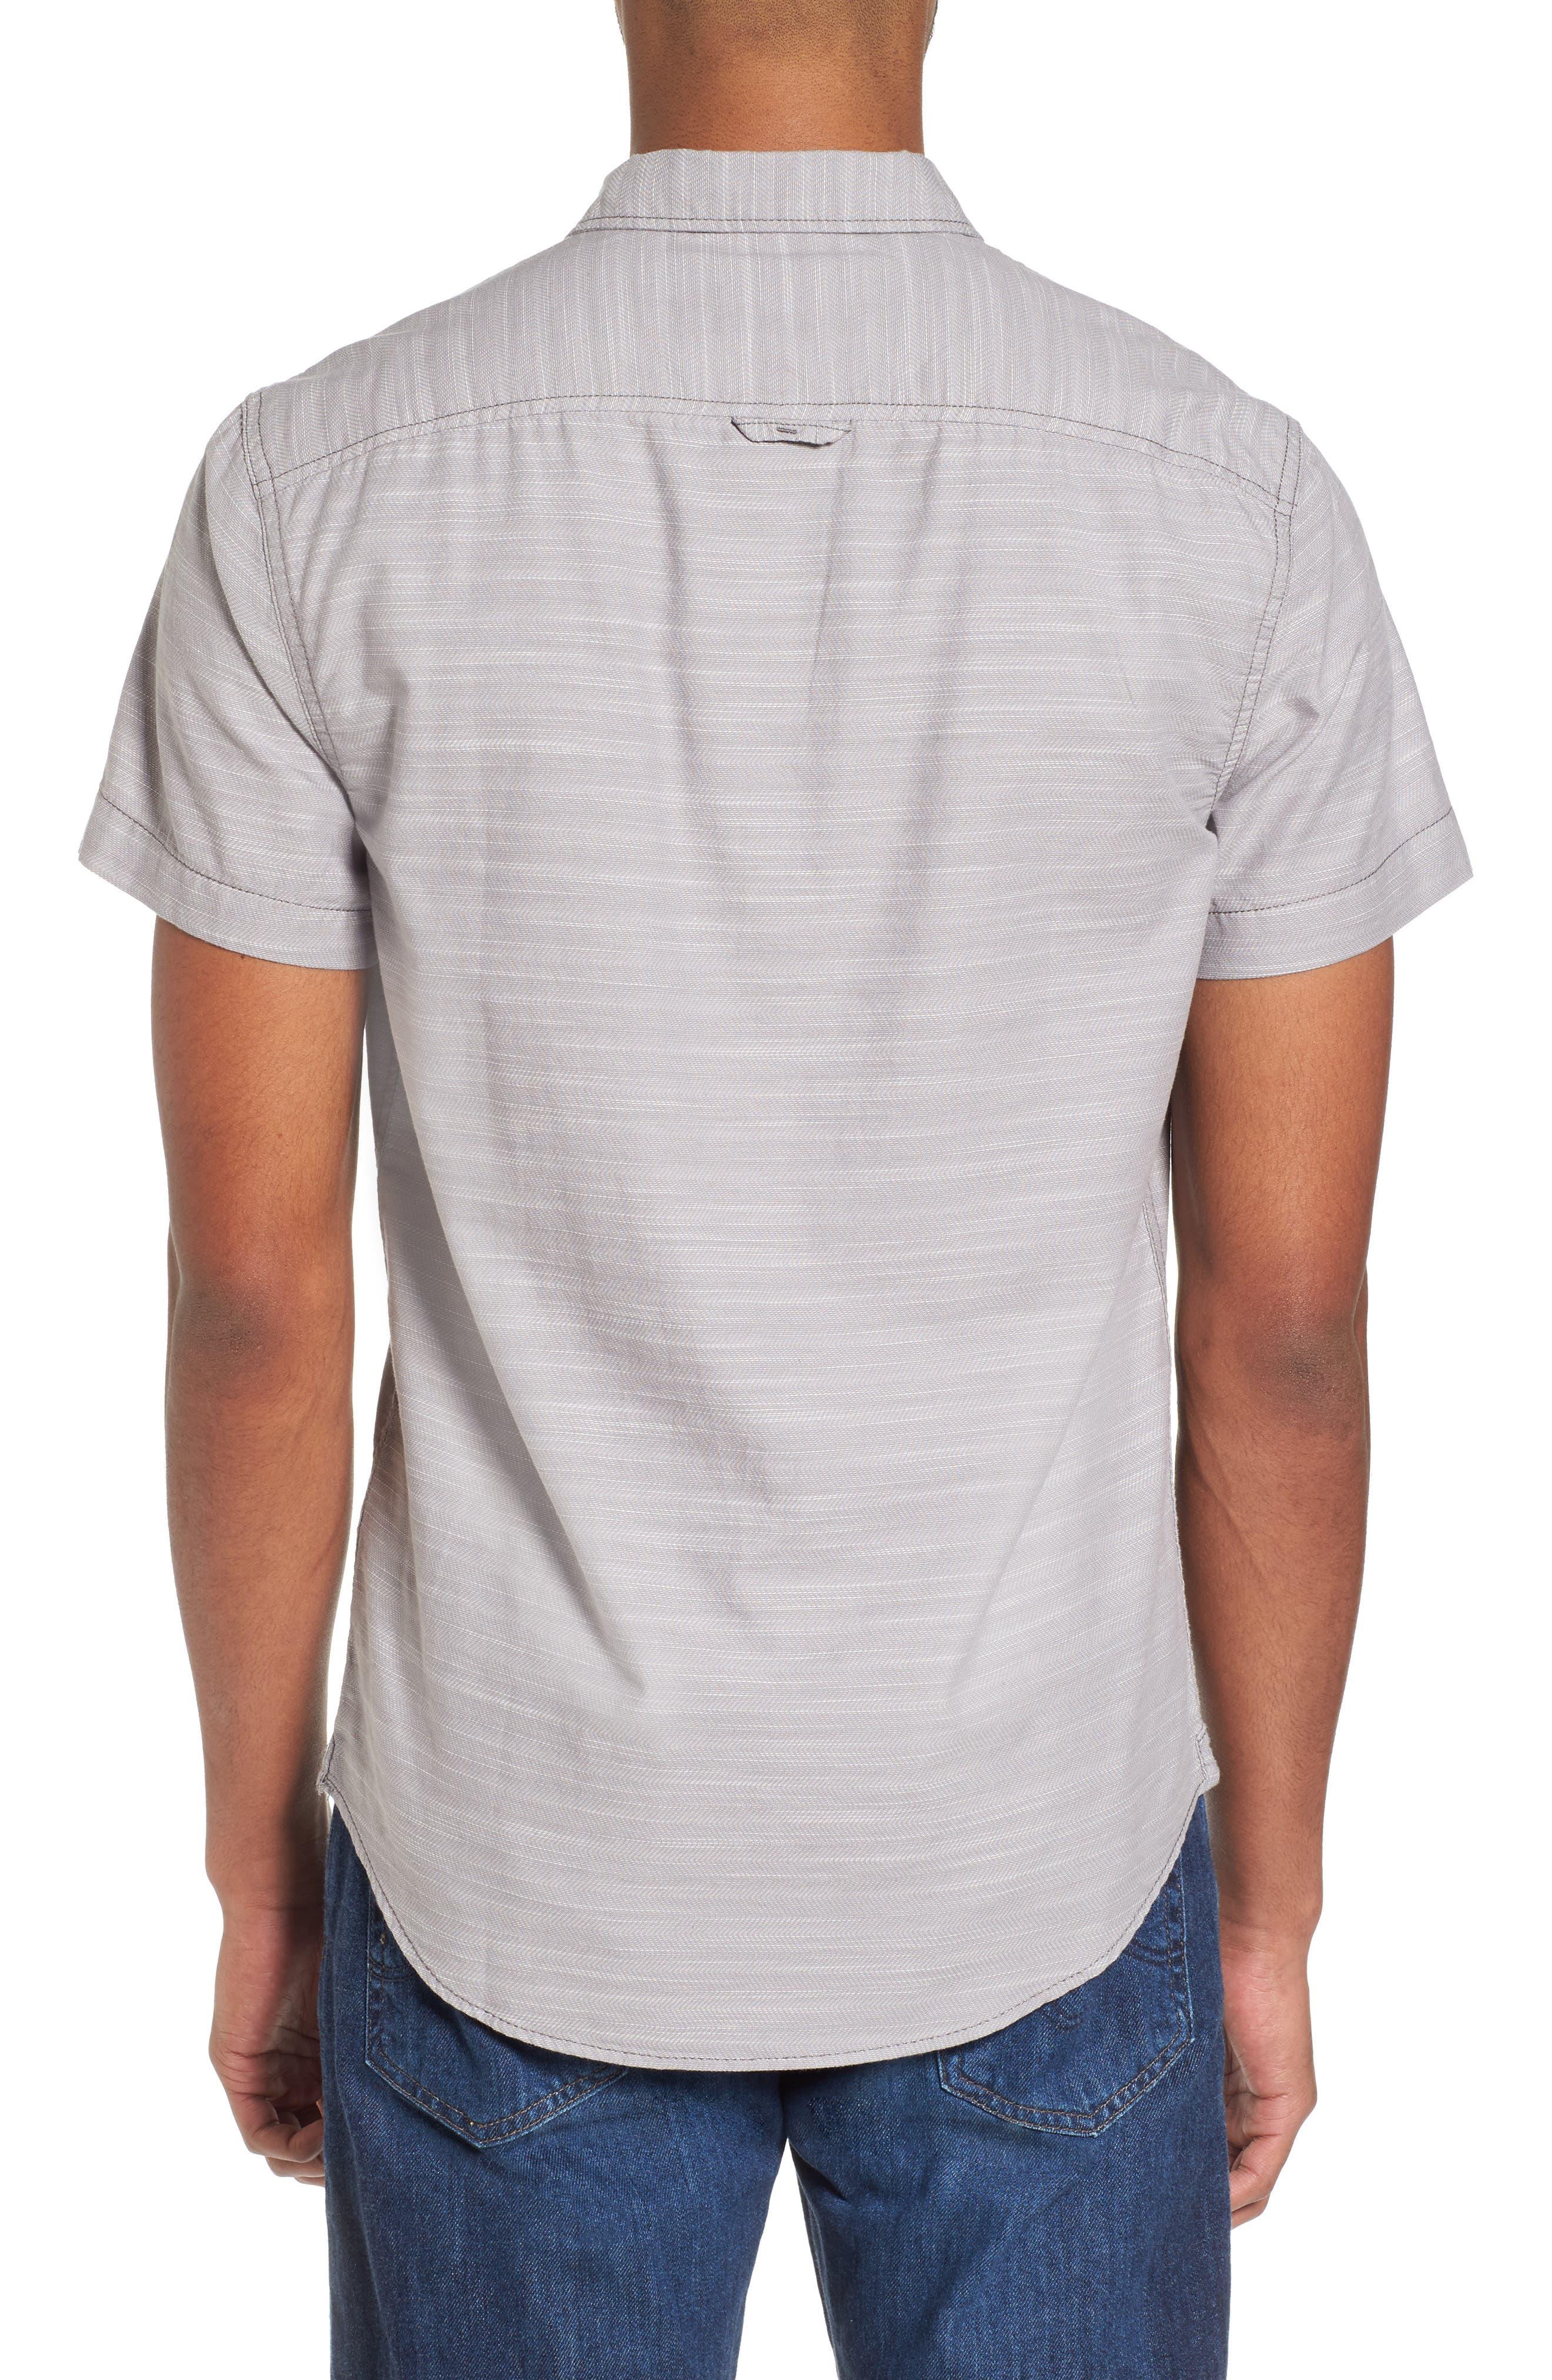 Herringbone Chambray Shirt,                             Alternate thumbnail 2, color,                             Grey Filigree Herringbone